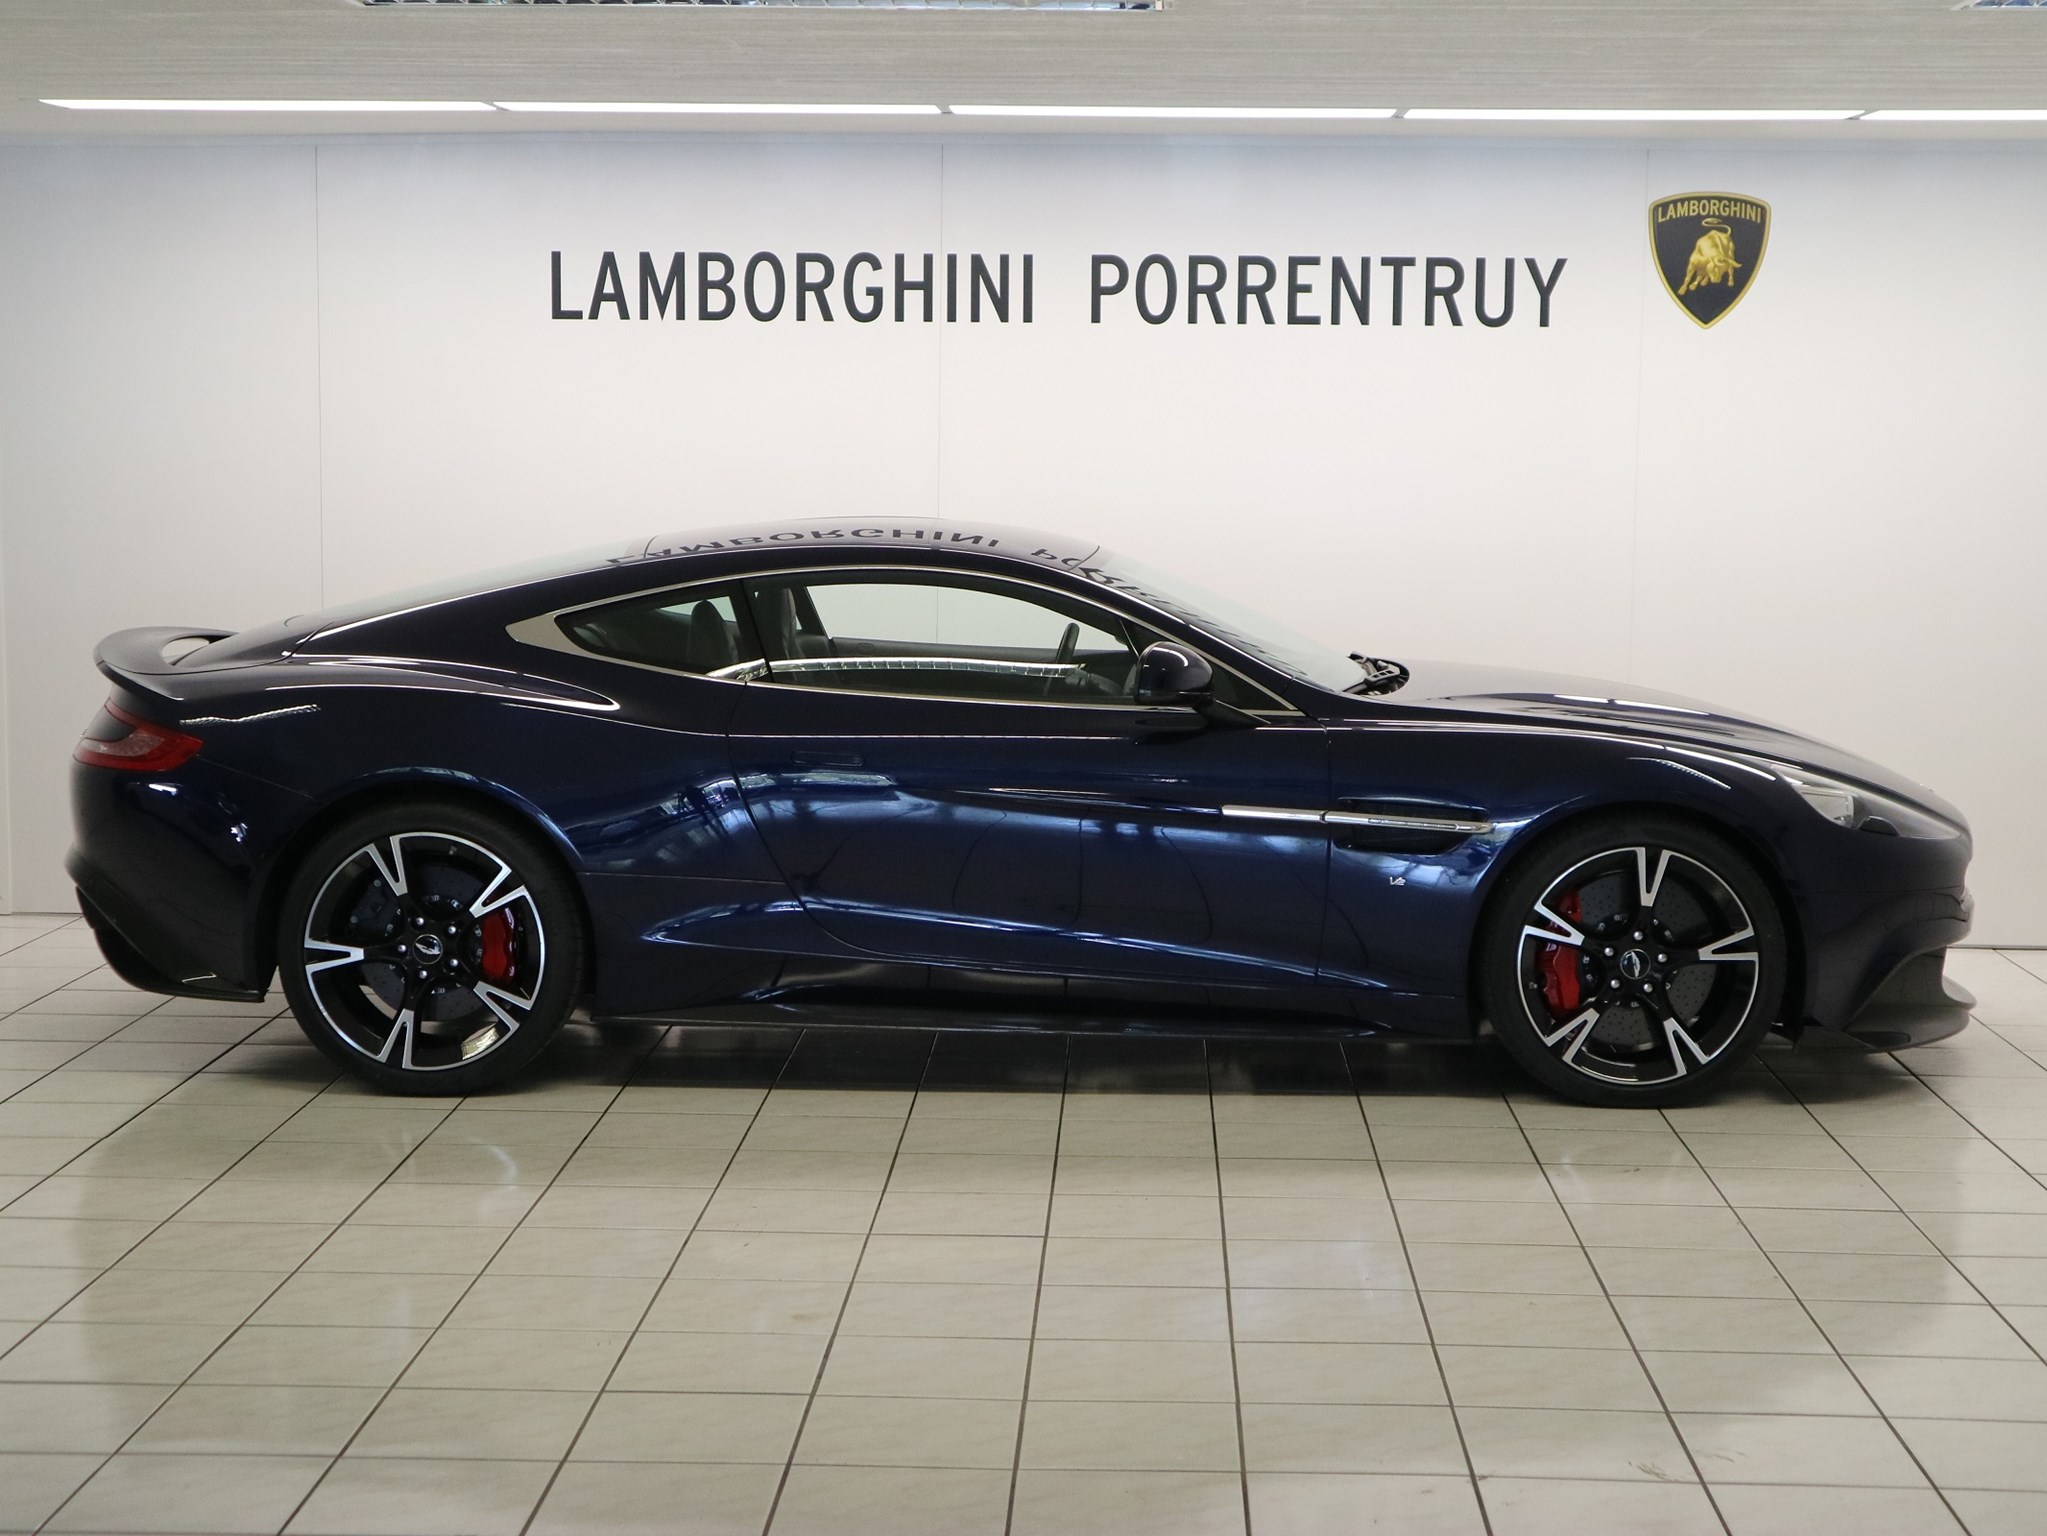 Sportauto Aston Martin Vanquish V12 Vanquish Vanquish S V12 Touchtronic 3 Kaufen Auf Carforyou Ch